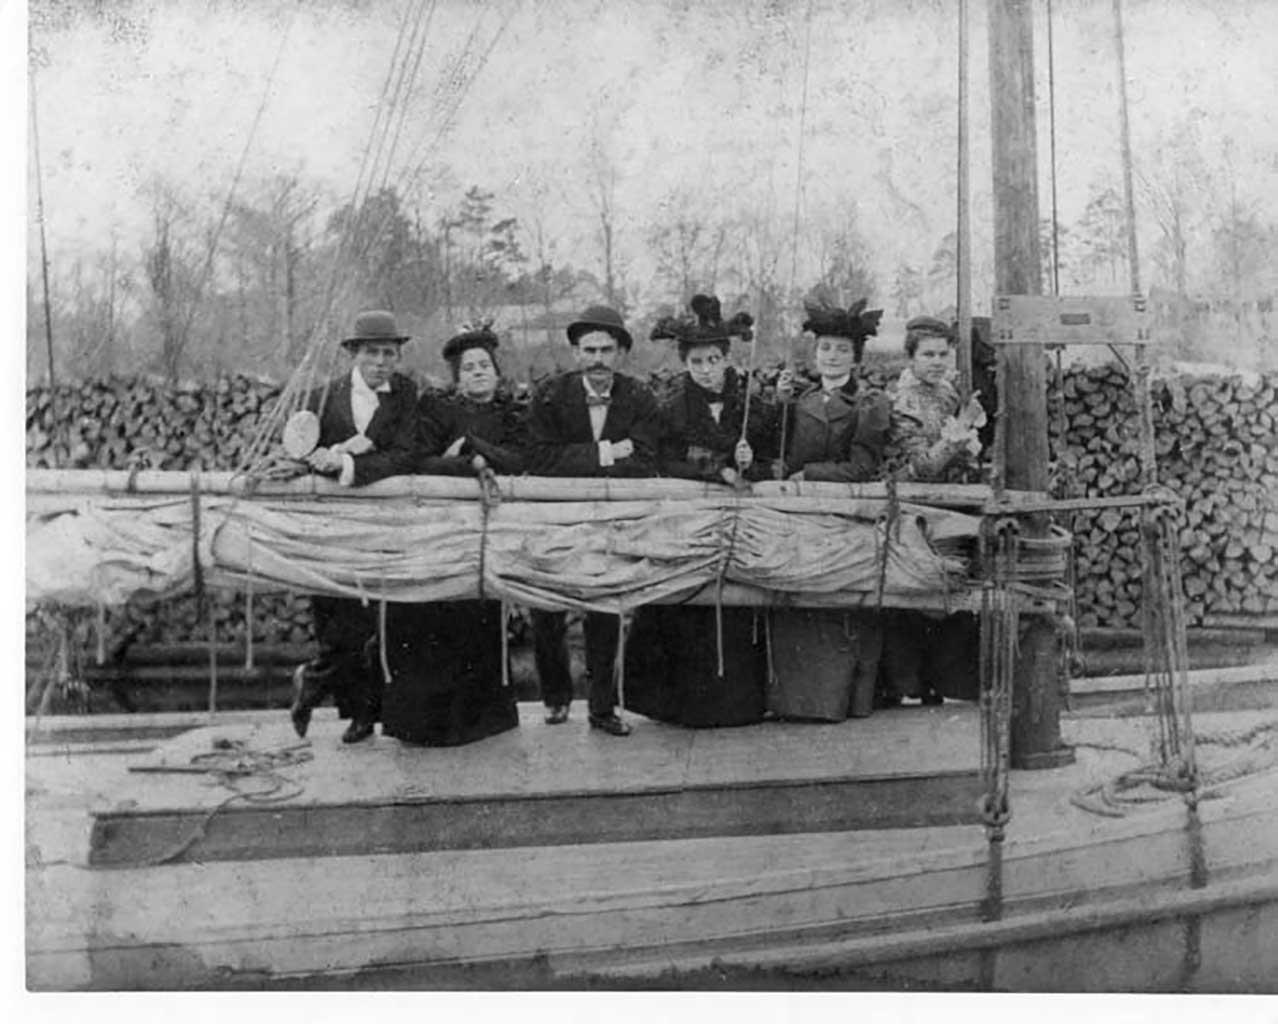 schooner-windrey-in-wester-branch-creek-l-r-claude-susie-gilliam-jim-causey-birdie-crump-manie-cook-teacher-eliz-kirk-brady-1897-img190